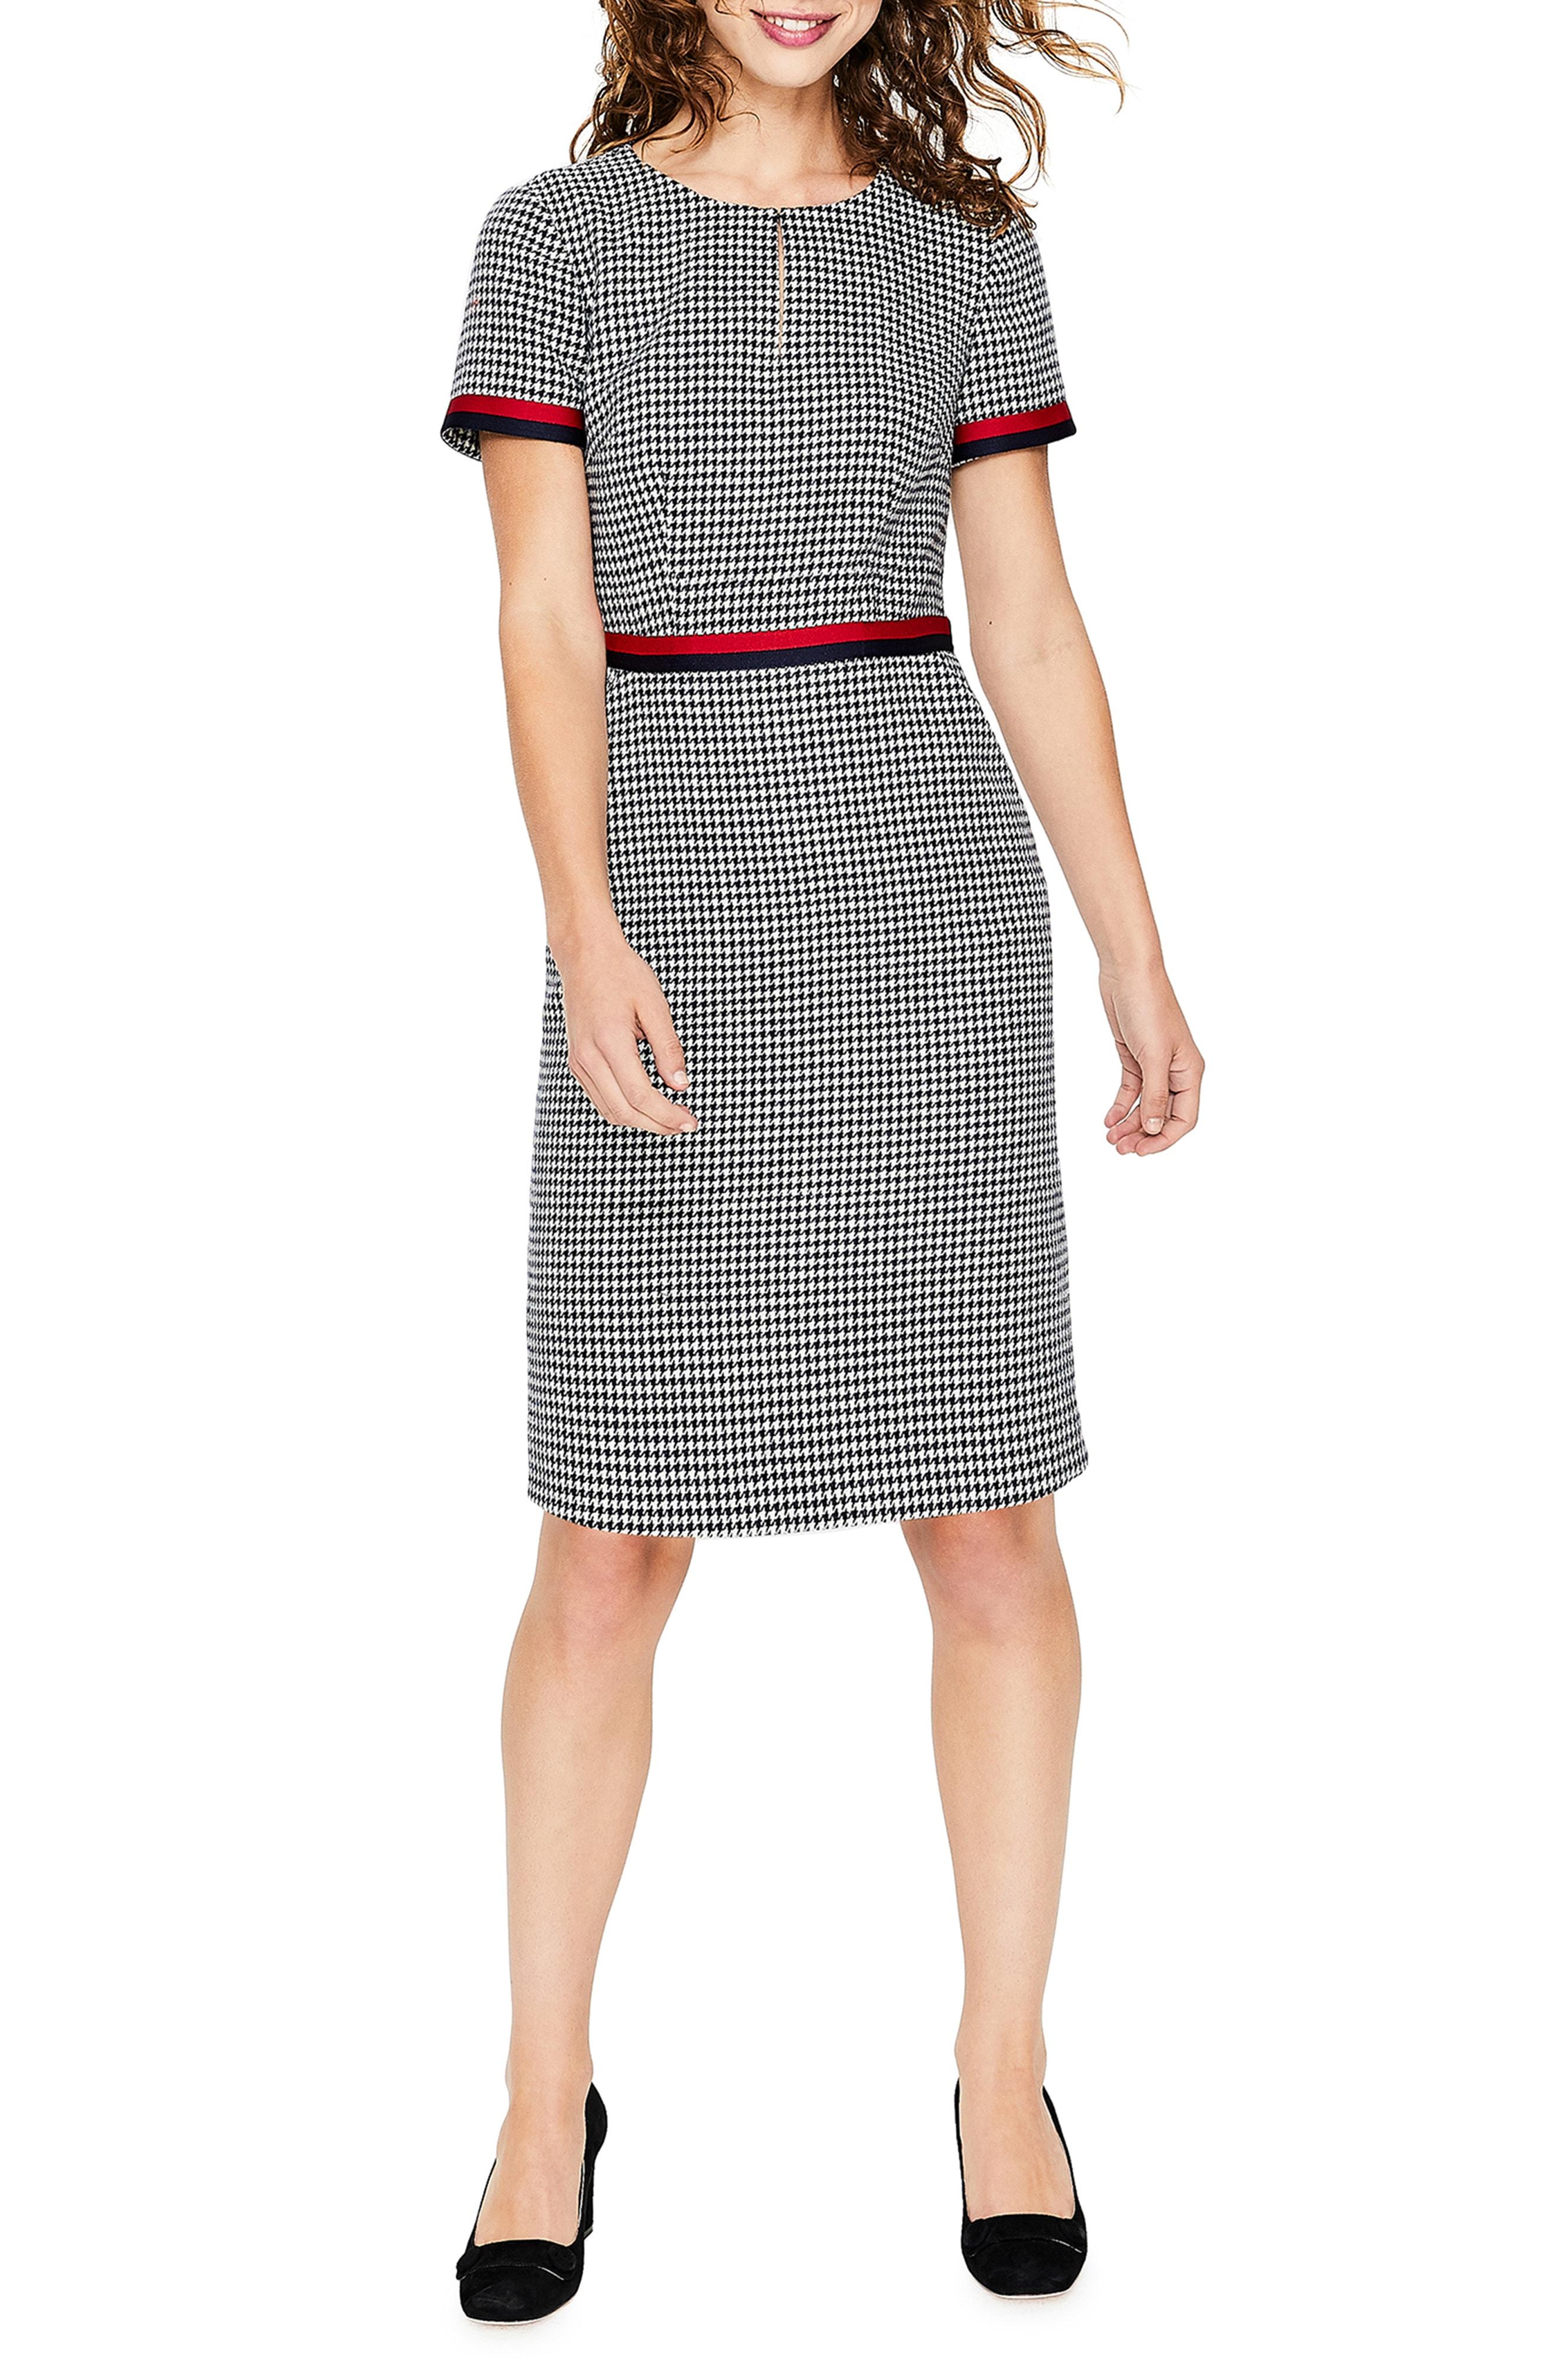 Boden Ribbon Trim Wool Tweed Dress